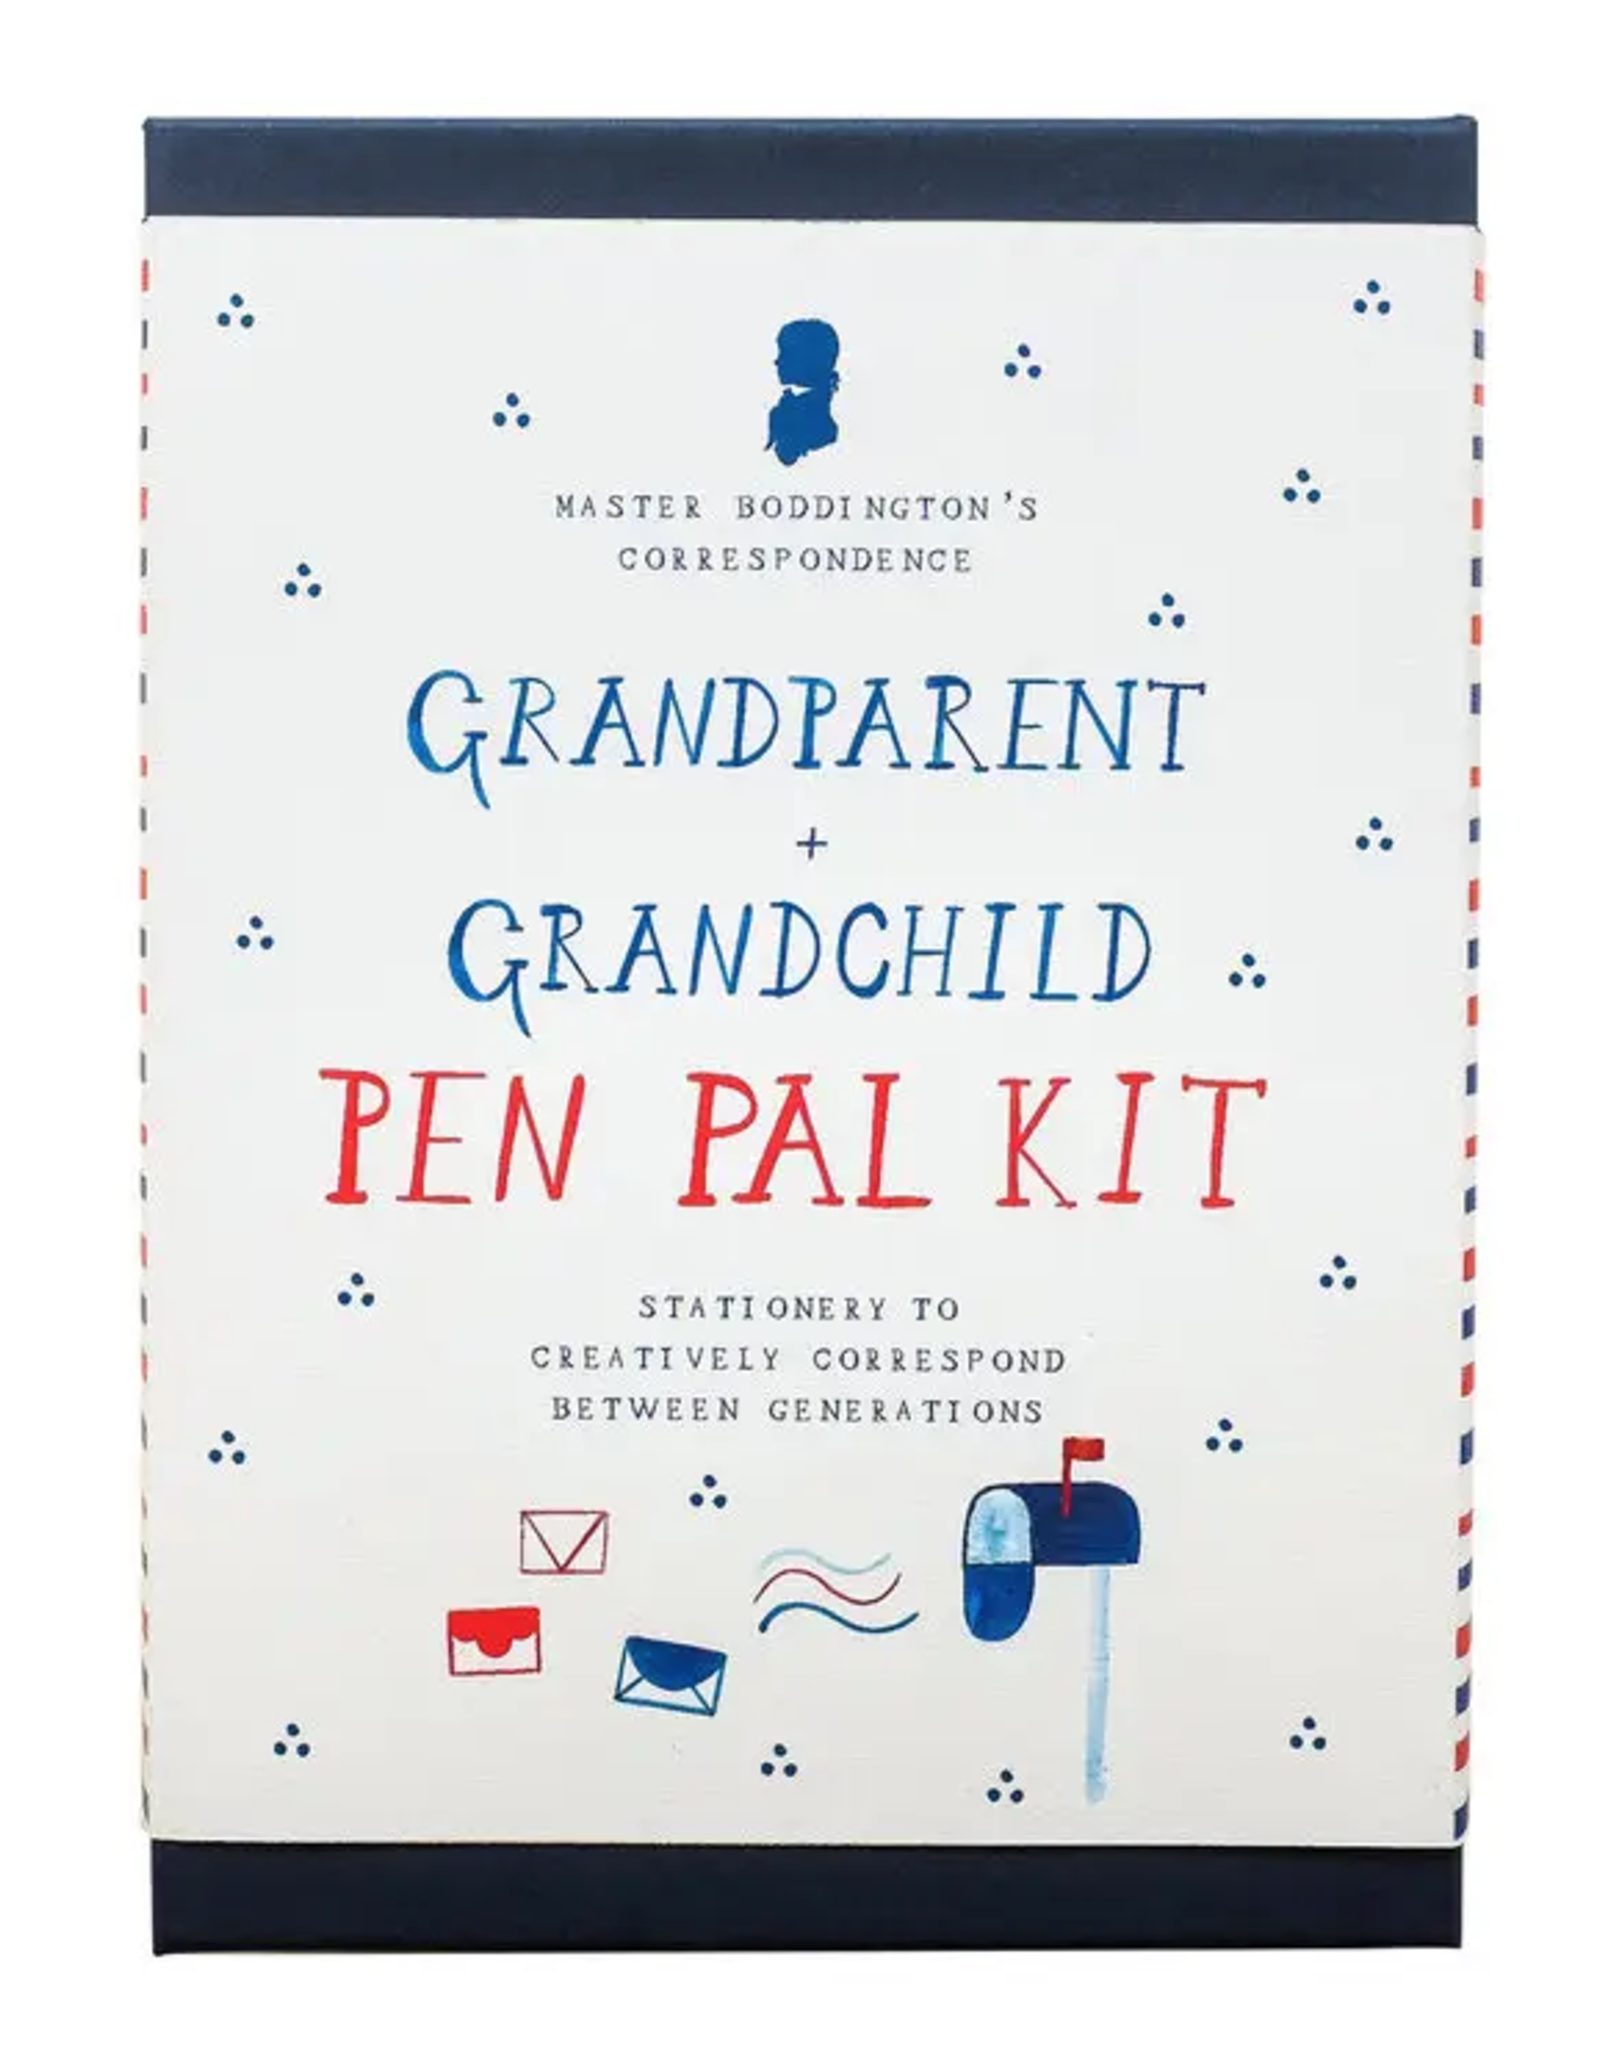 Grandparent + Grandchild Pen Pal Kit